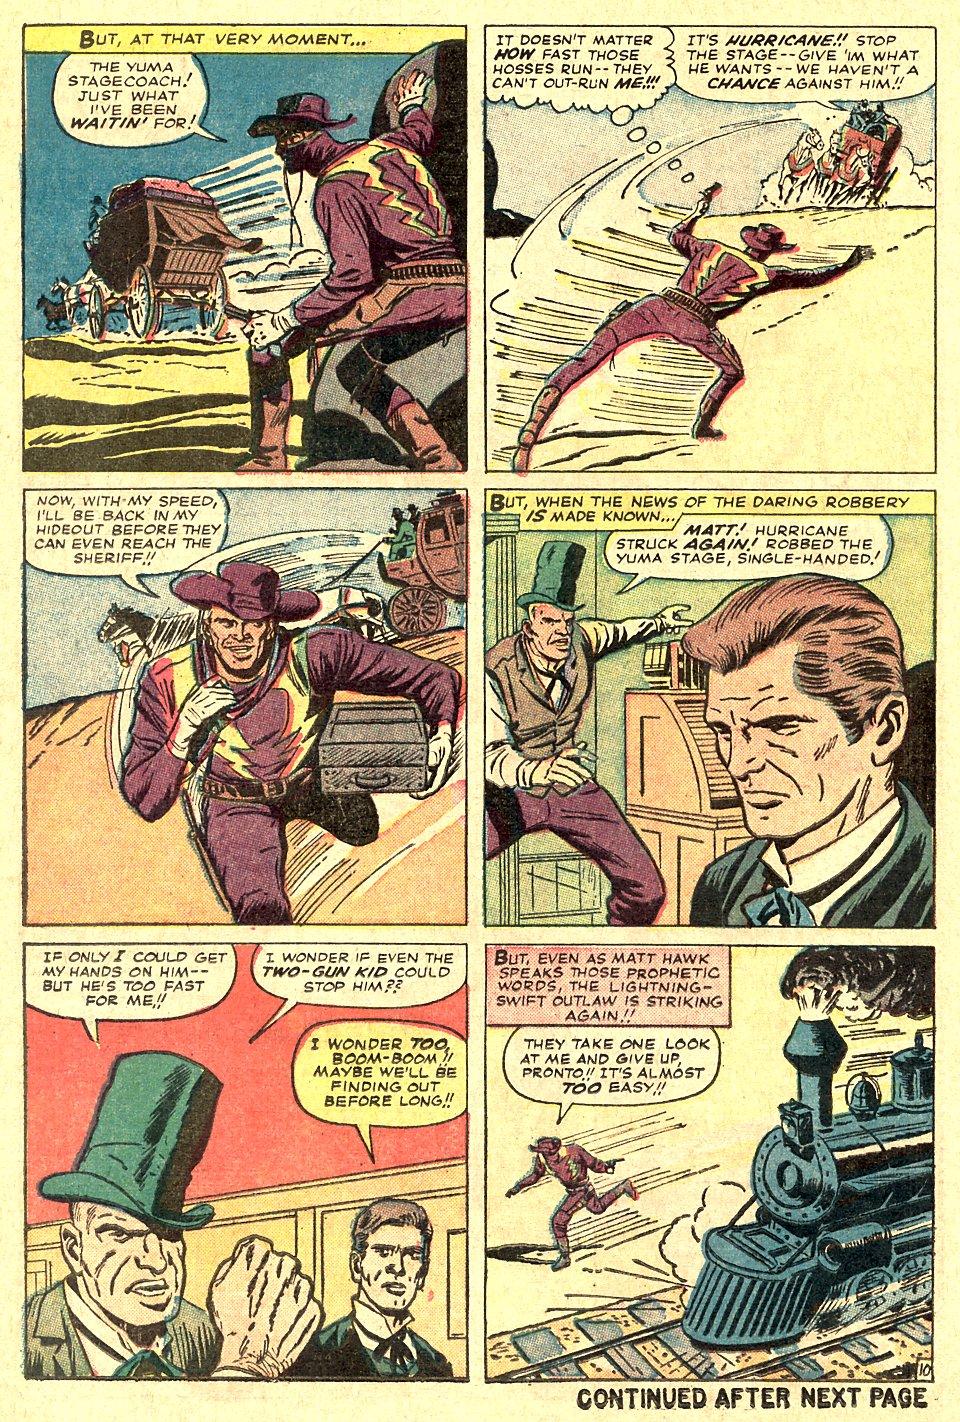 Read online Two-Gun Kid comic -  Issue #70 - 14